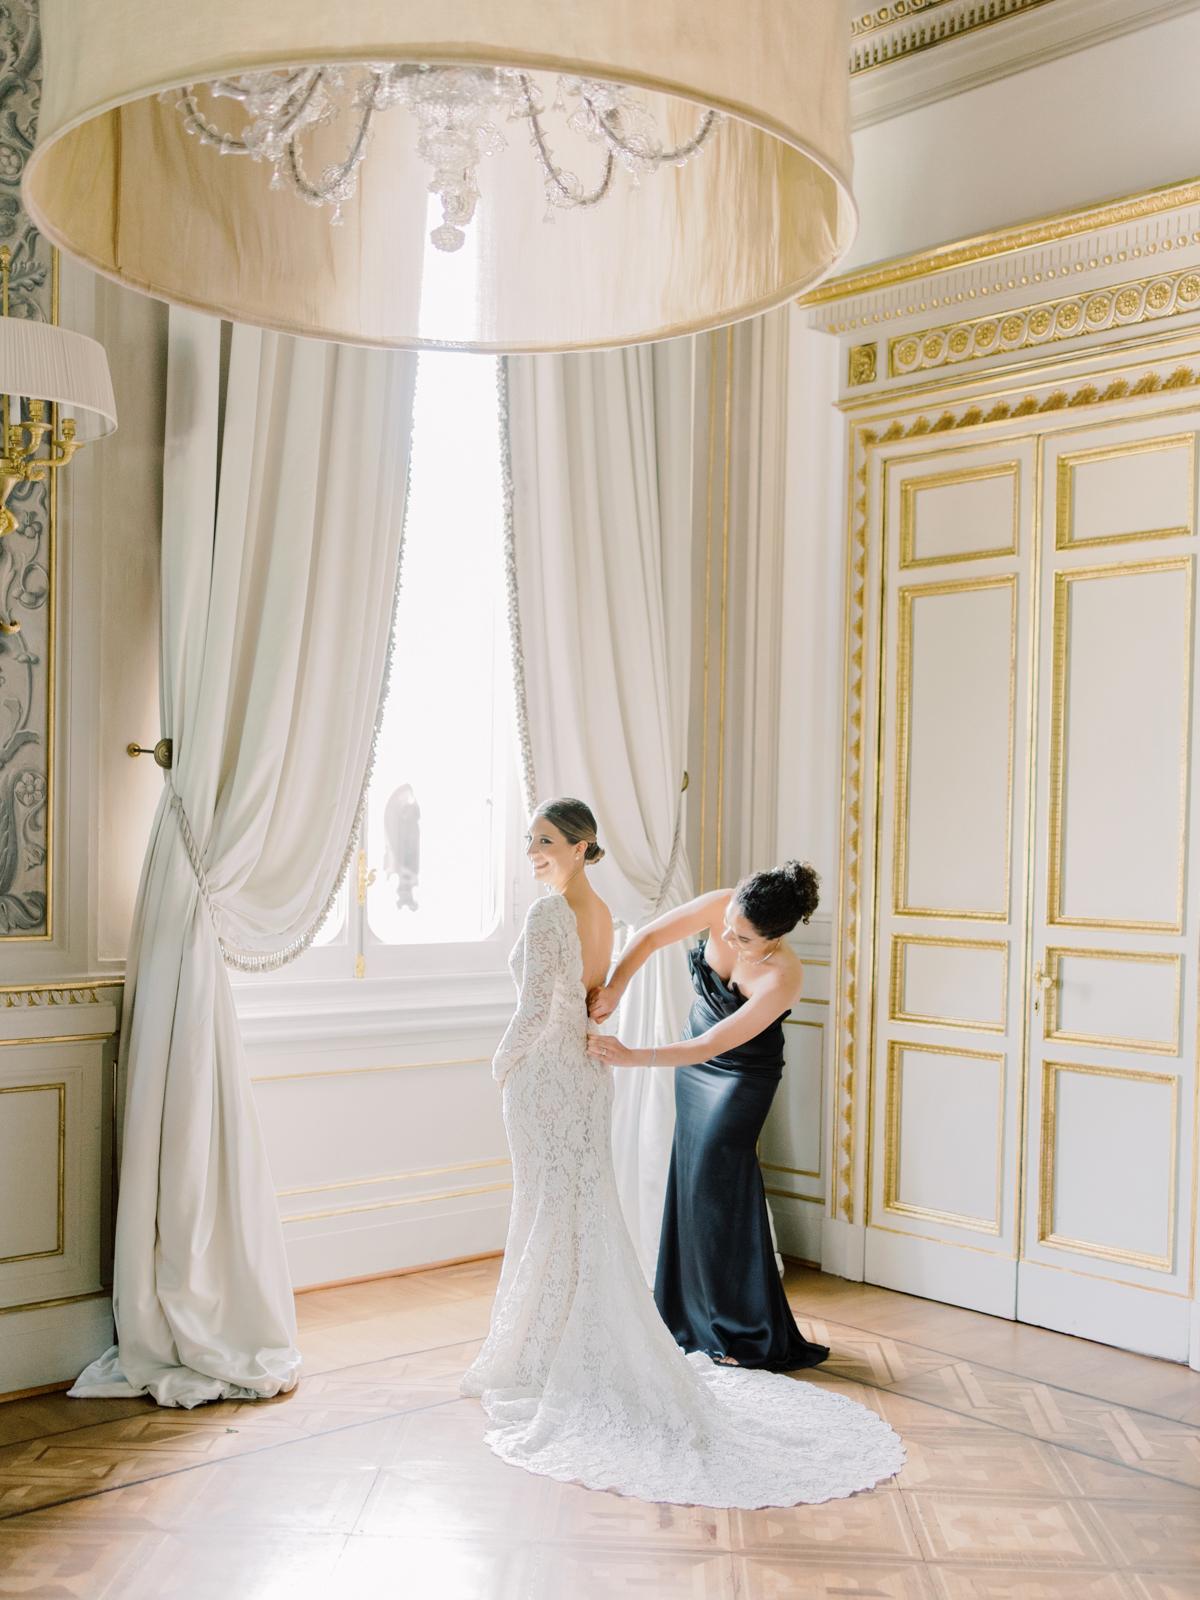 saghar ben wedding bride in dress by window